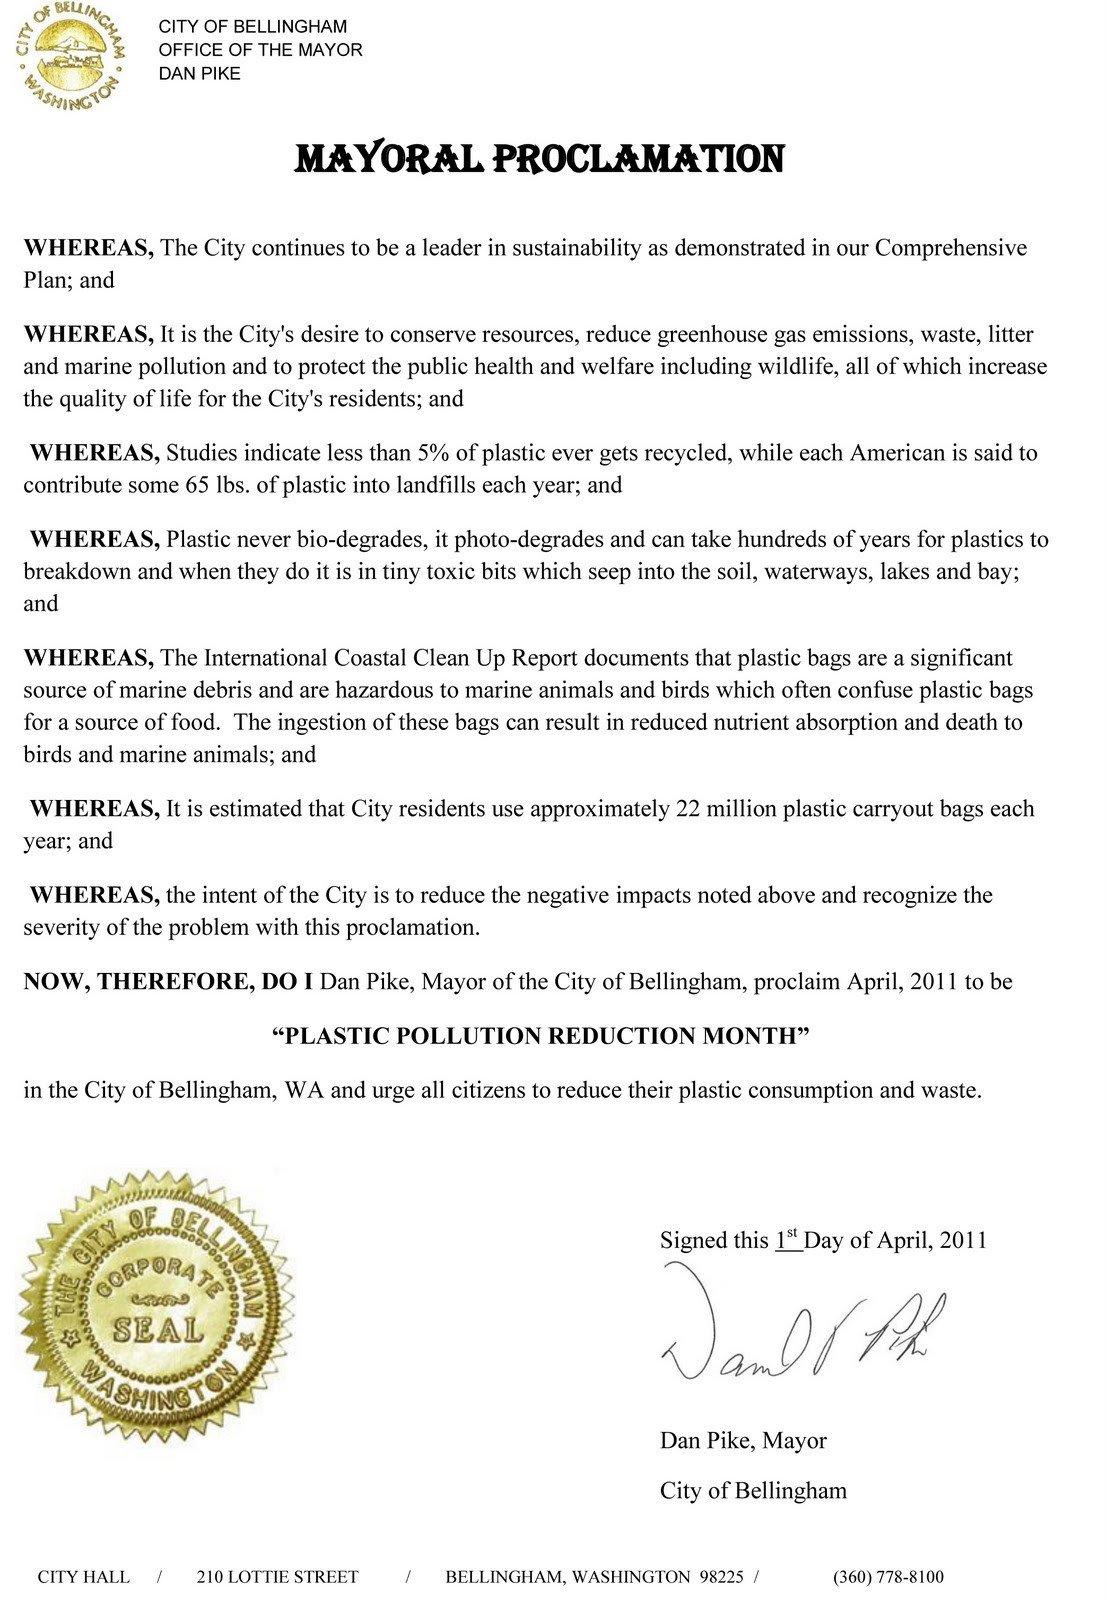 Mayoral Proclamation Template Bag It Bellingham